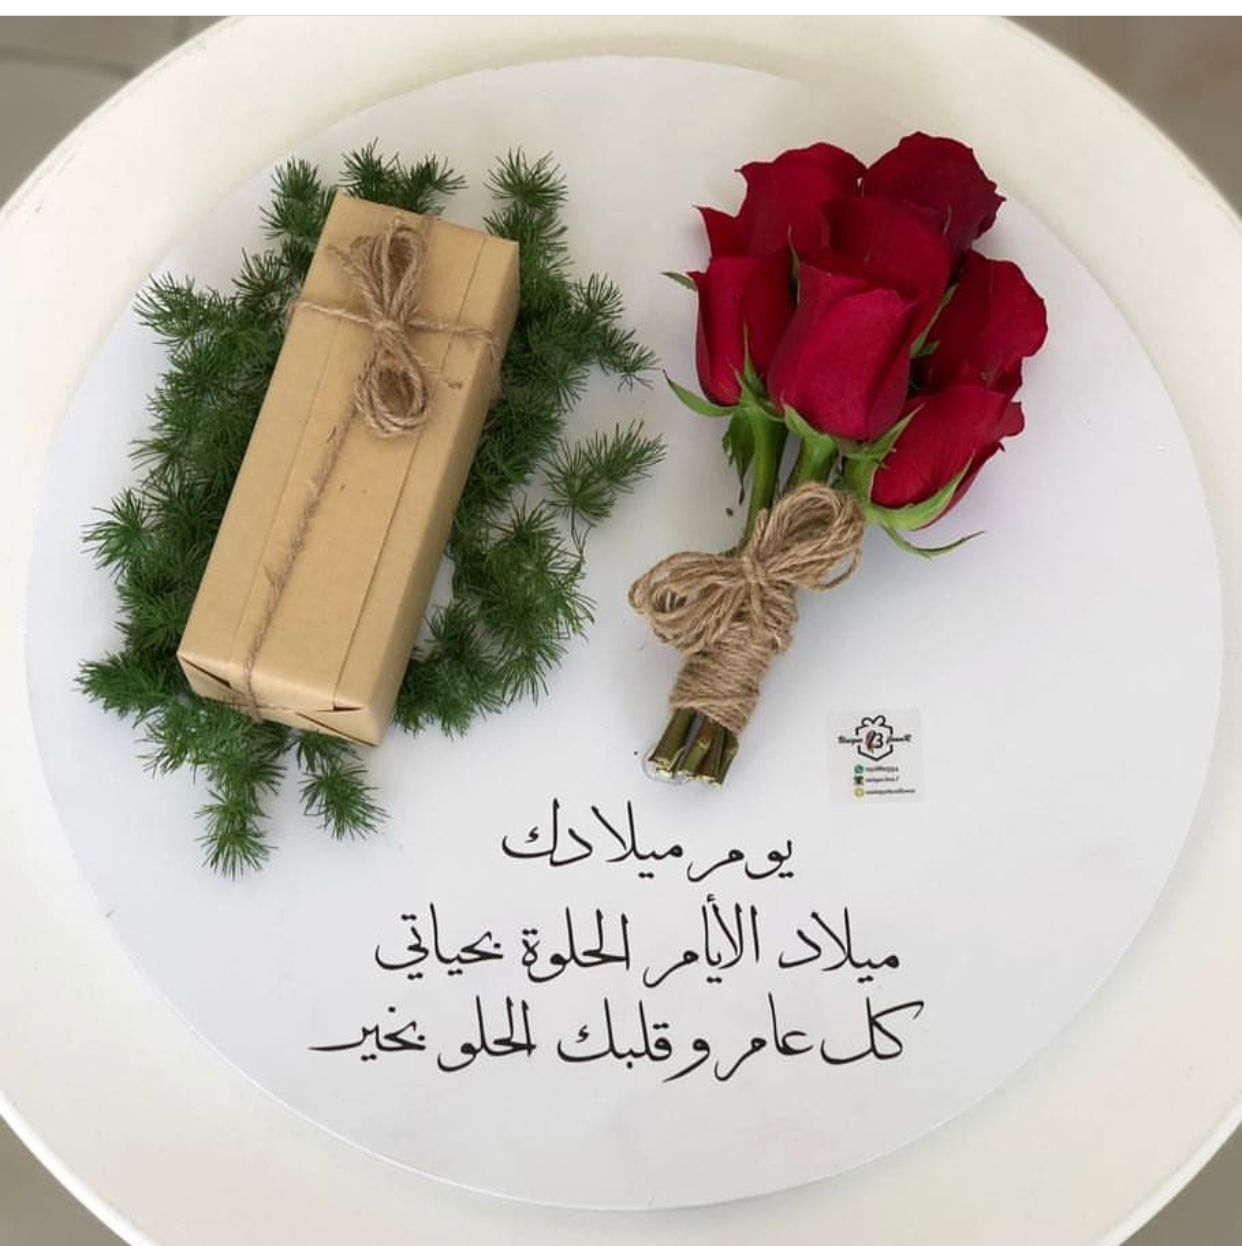 Pin By Yousra Sabir On افكار للزوج Happy Birthday Wishes Quotes Birthday Wishes Quotes Birthday Wishes Cake